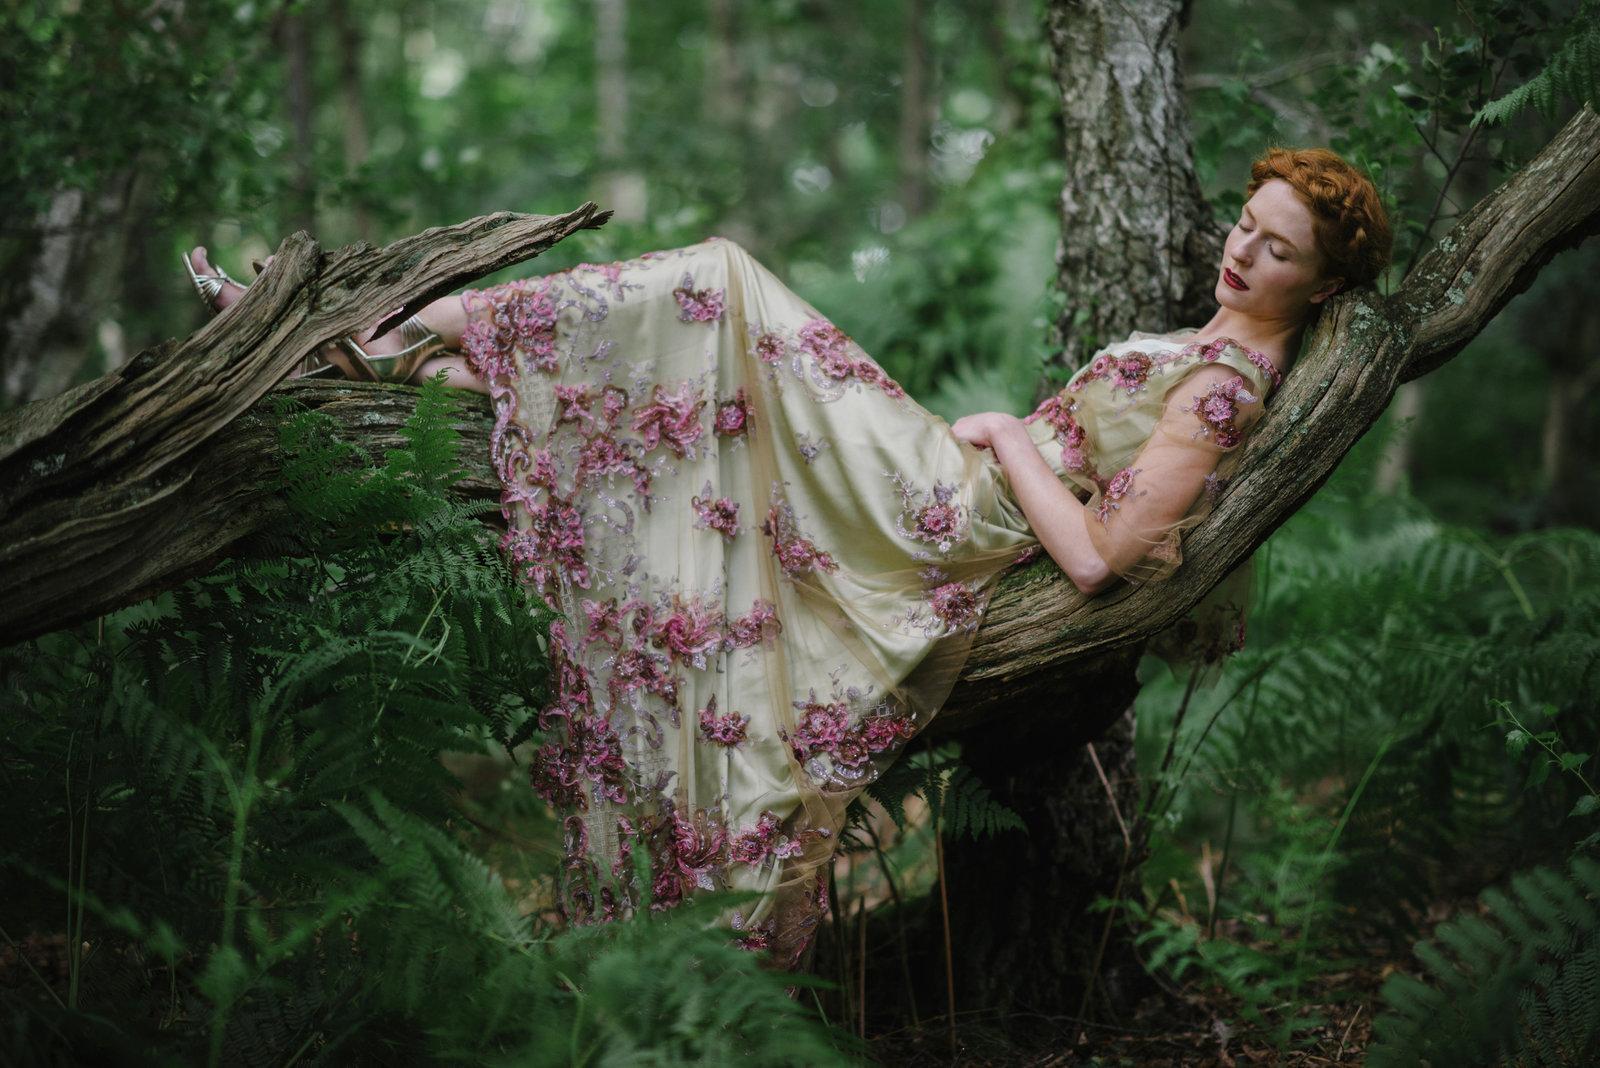 Gainsborough_belle_epoque_green_lilac_wedding_dress_JoanneFlemingDesign_JMS (14)web